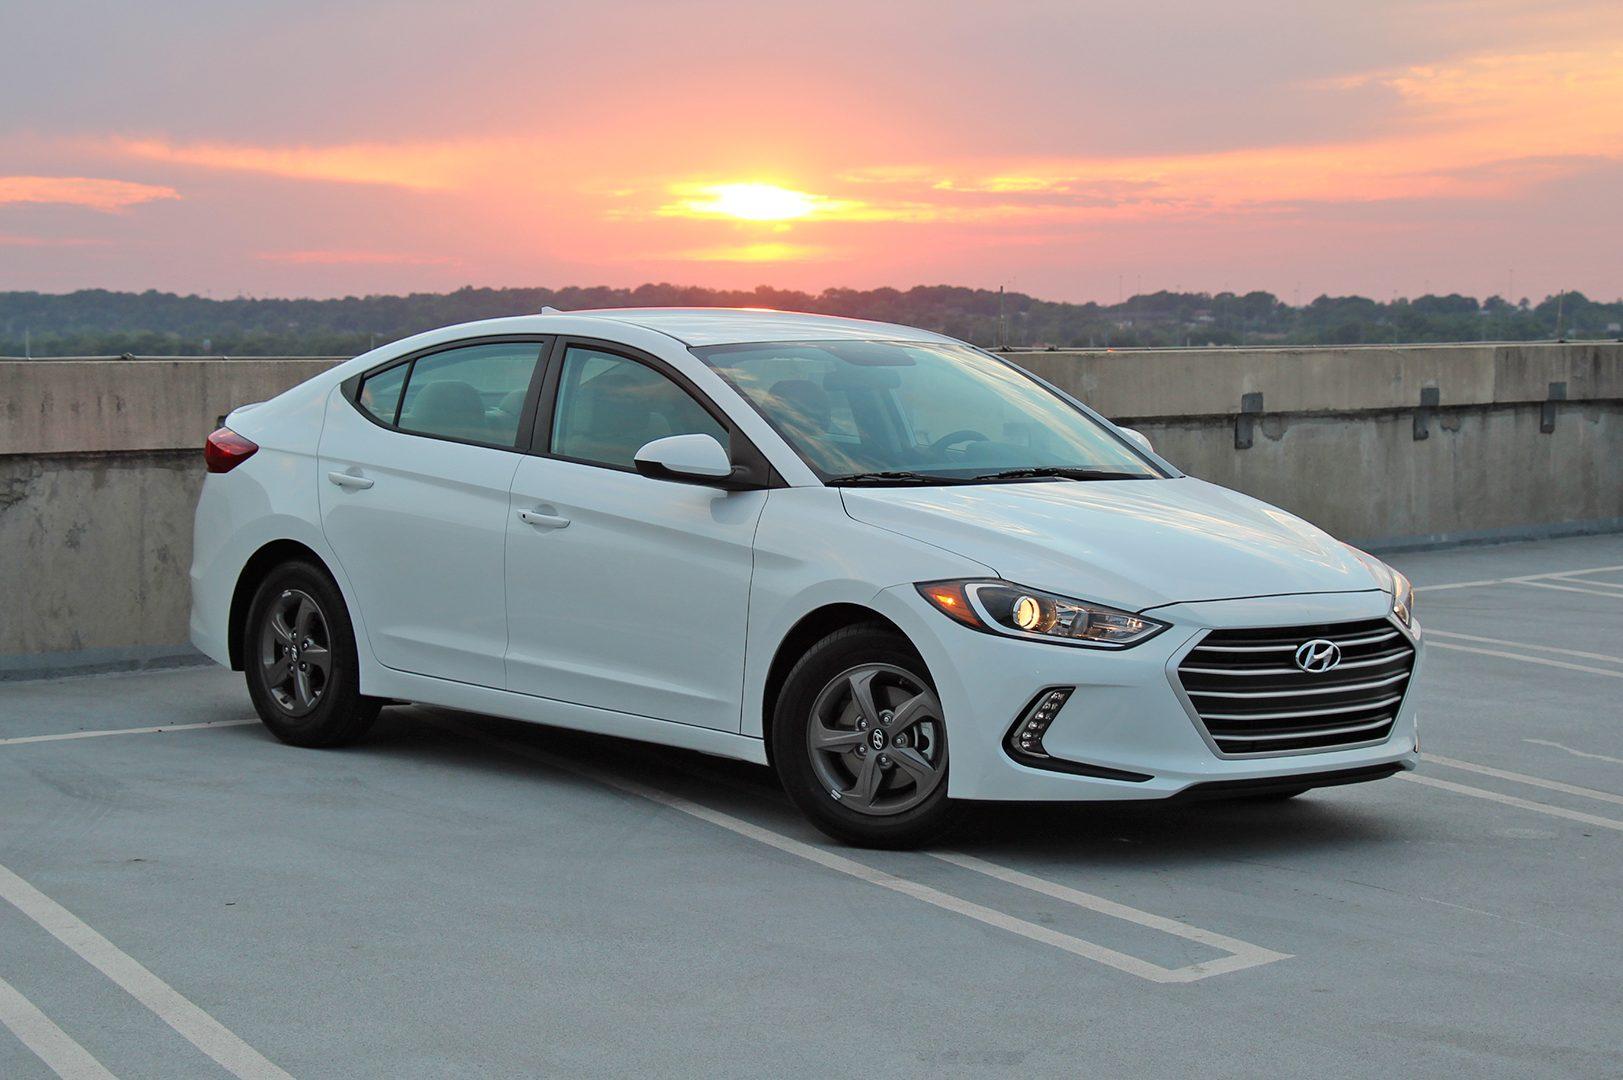 road reviews review elantra car driving limited test img hyundai